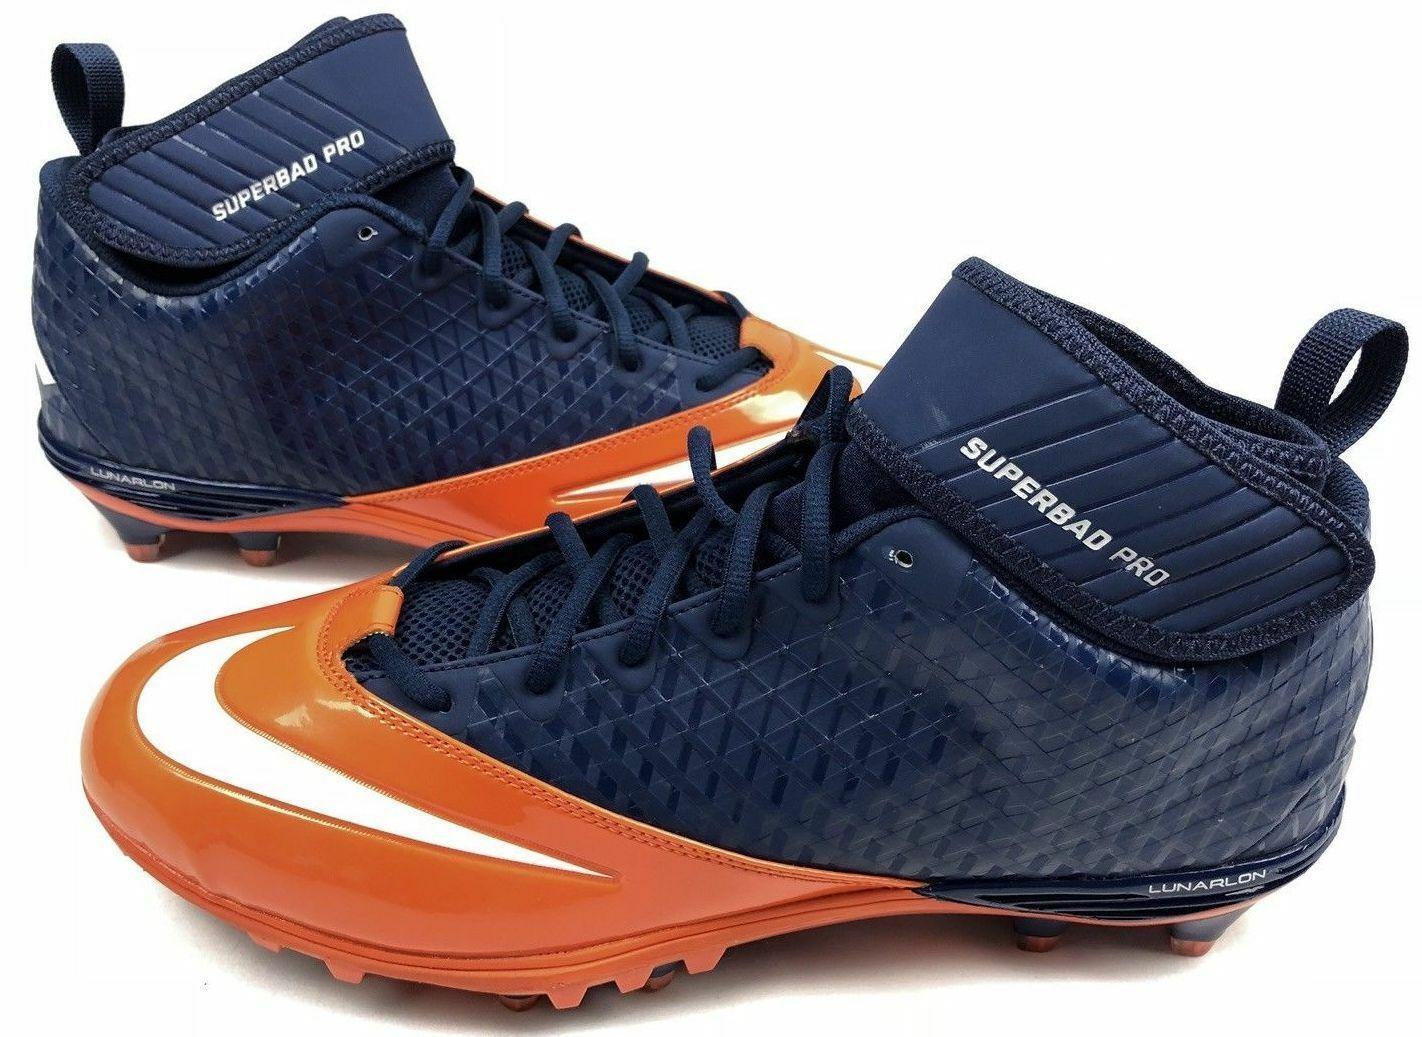 Nike Lunar Superbad Pro TD Mid Men's Football Cleats 534994, Orange/Blue, Sz 15 - $59.39